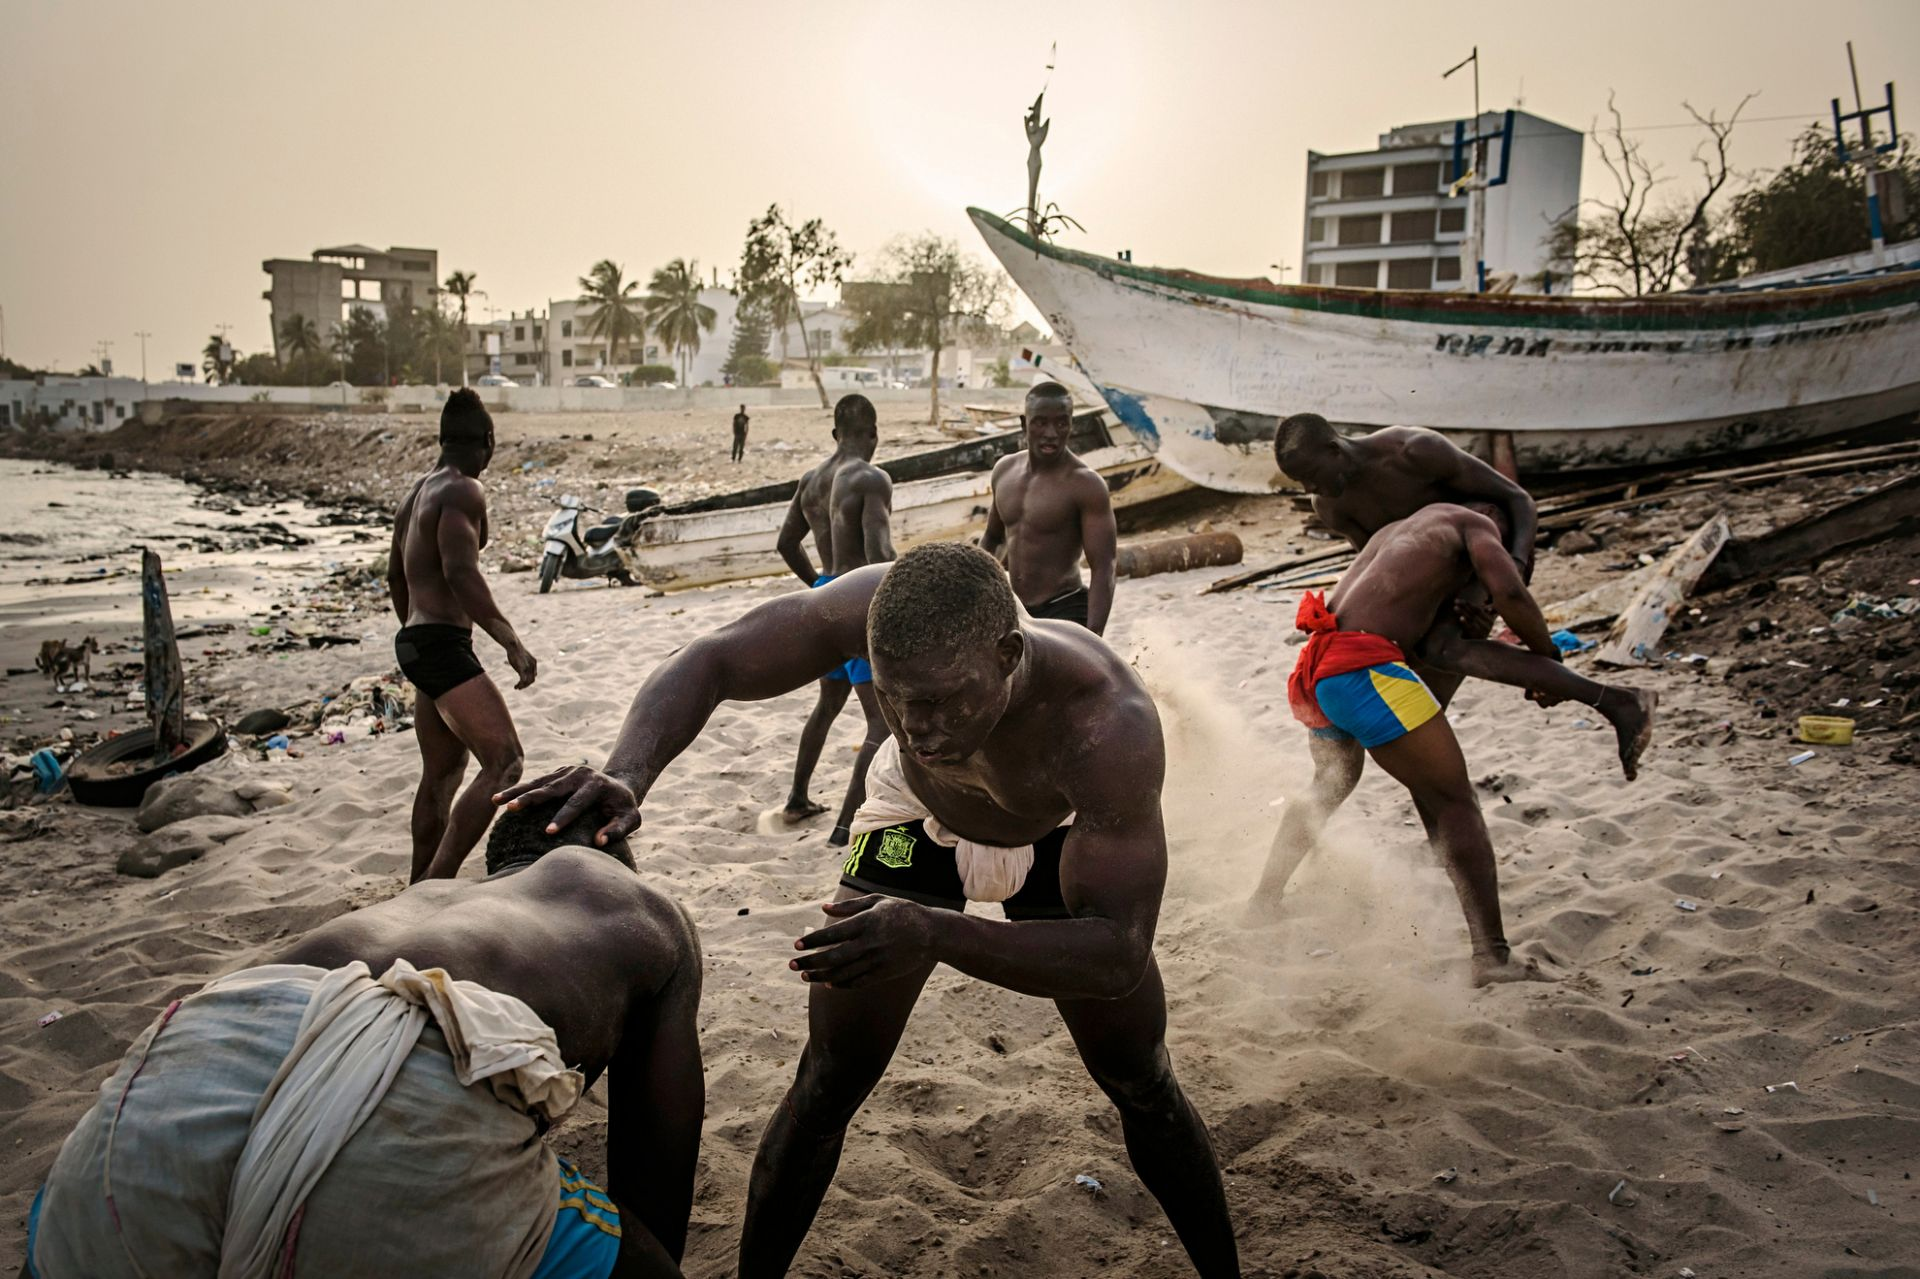 The Gris Gris Wrestlers of Senegal - 4